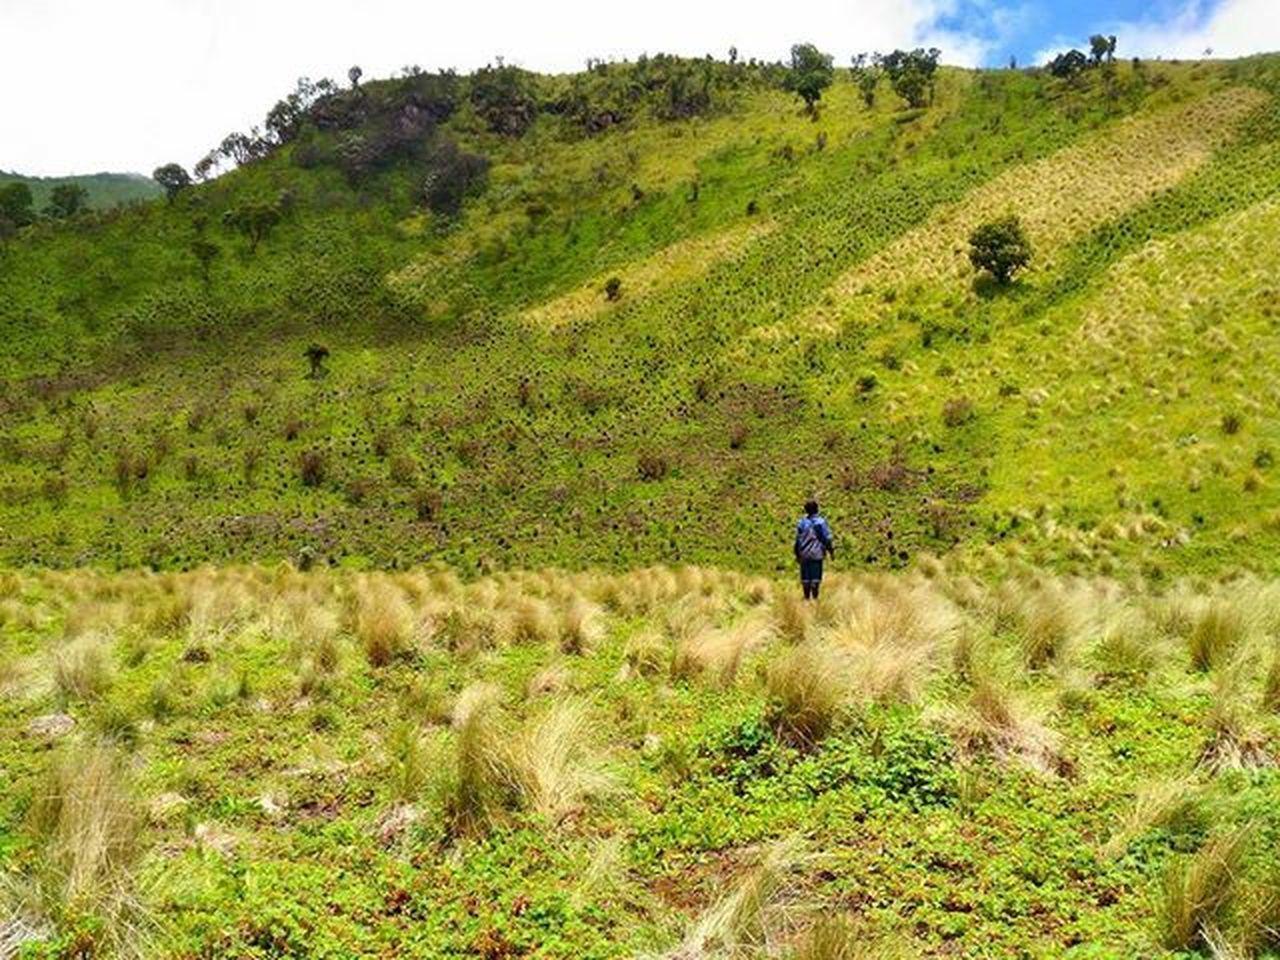 Sabanamu benar-benar istimeewa !!! . . Loc : Sabana II , Gunung Merbabu , Jawa Tengah . Pendakiindonesia Id_pendaki Indonesiakeren Exploregunung Pendakikusam Gunungindonesia Explorependaki Merbabu Jawatengah